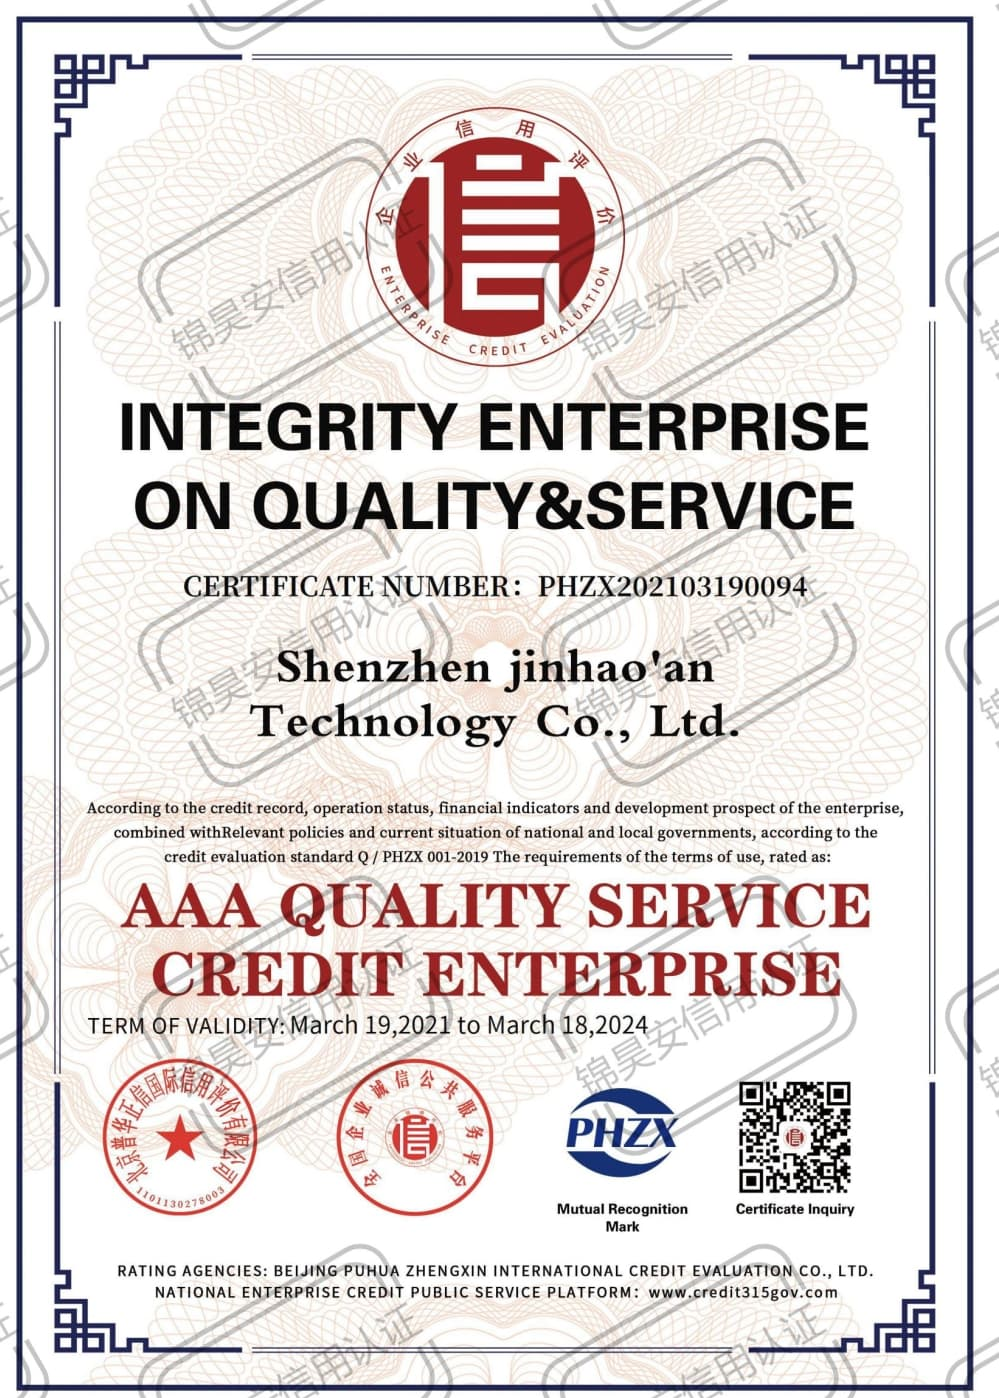 Integrity Enterprise On Quality & Service